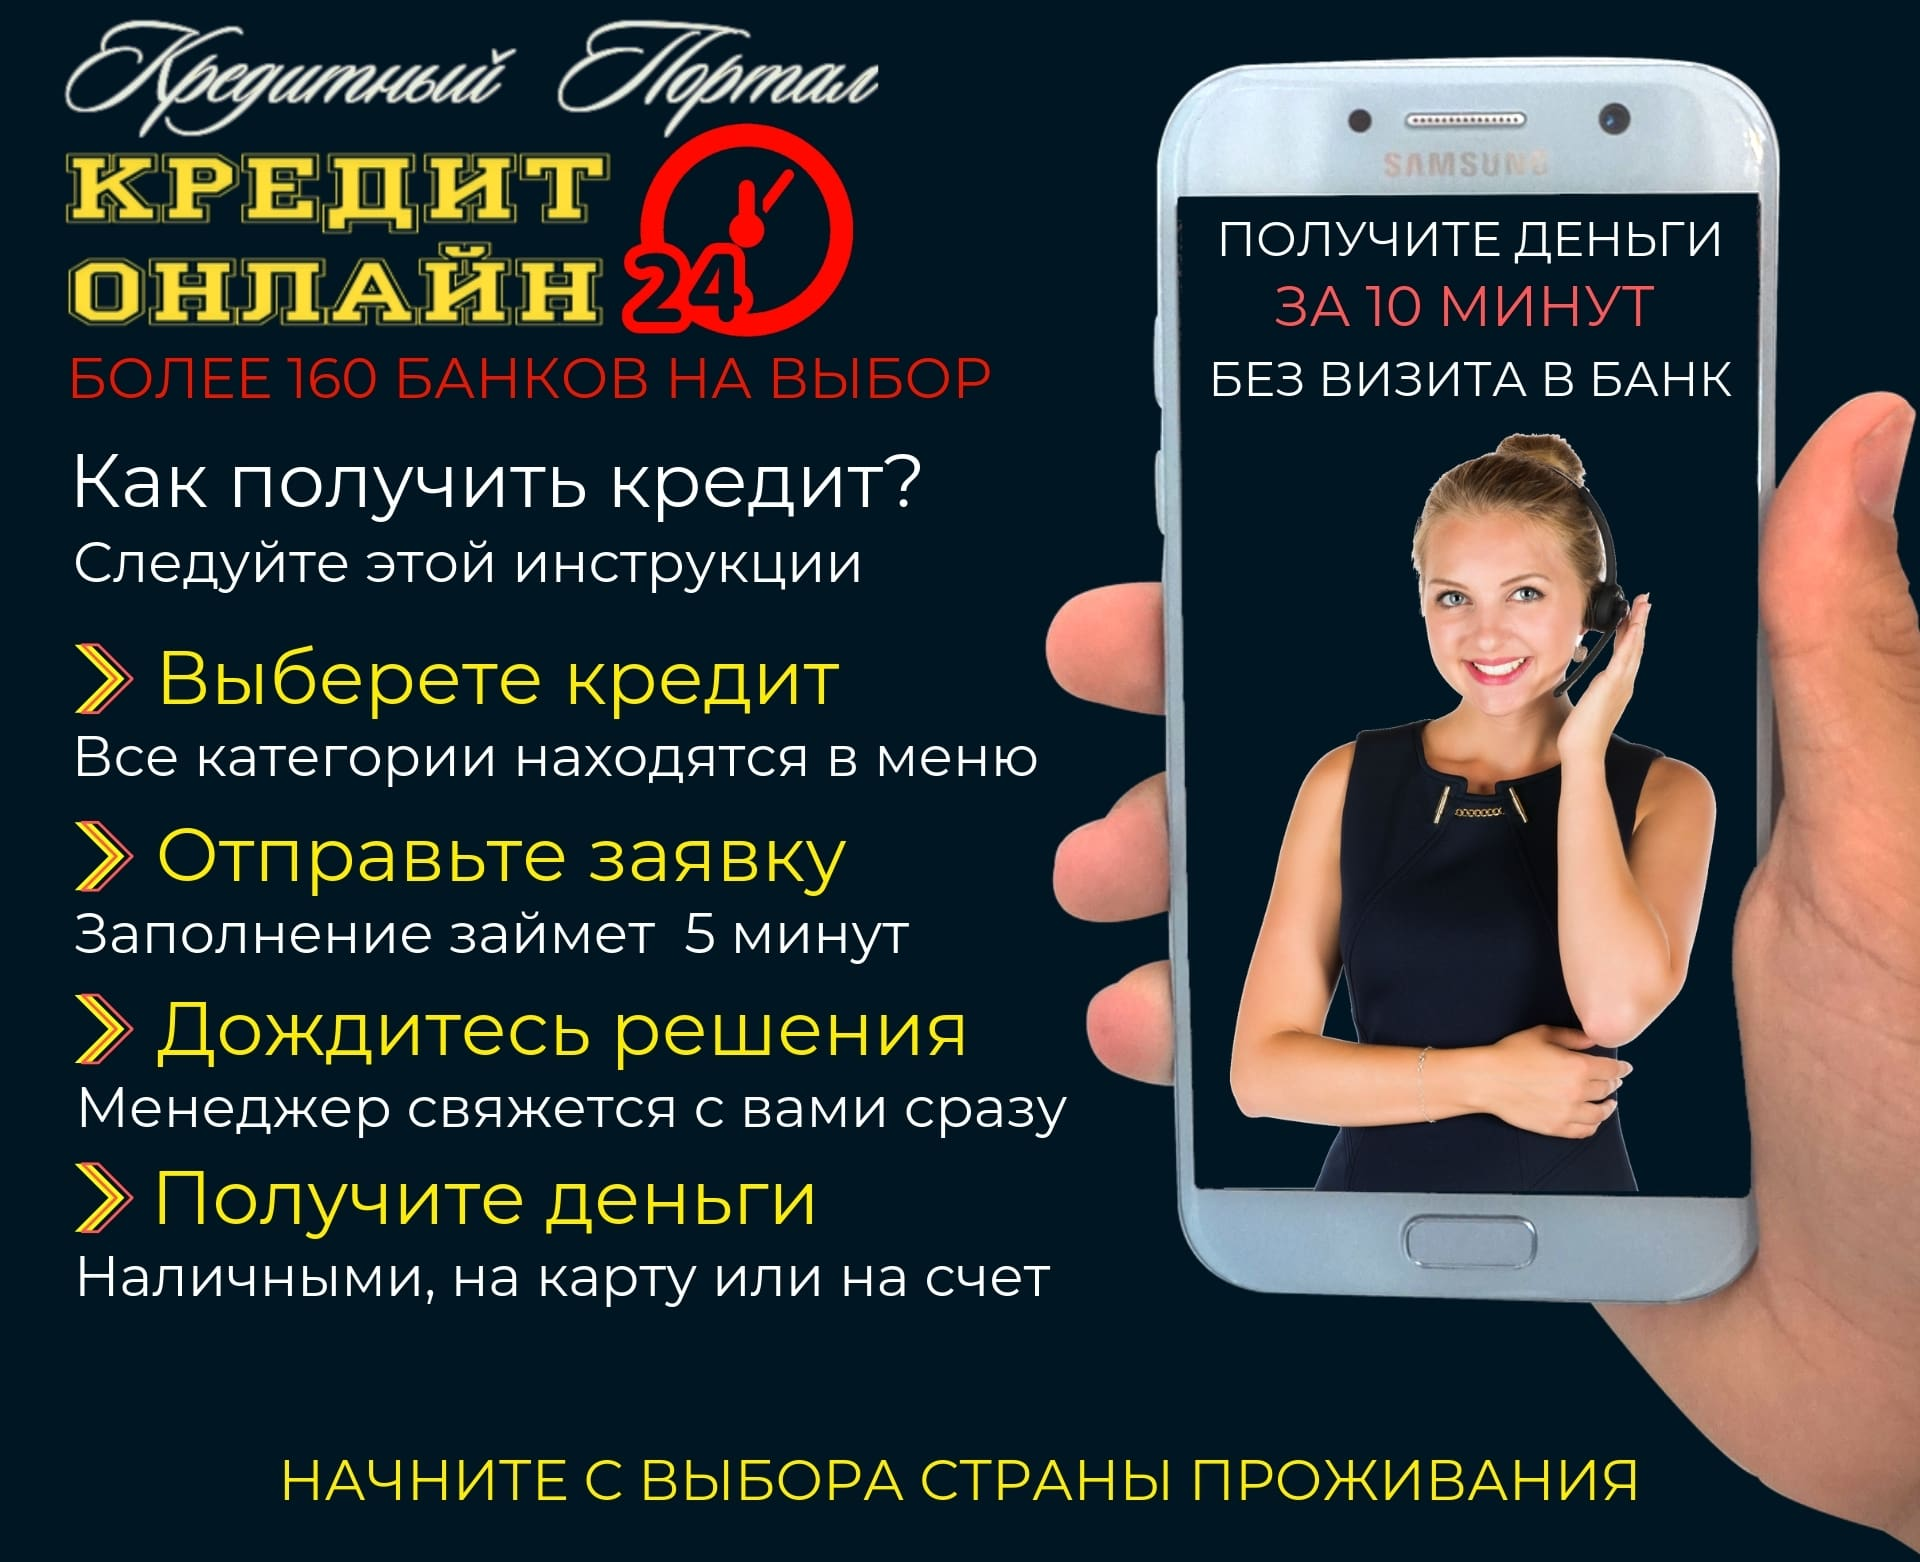 Кредитный портал кредит онлайн 24 kredit-24-onlajn.ru